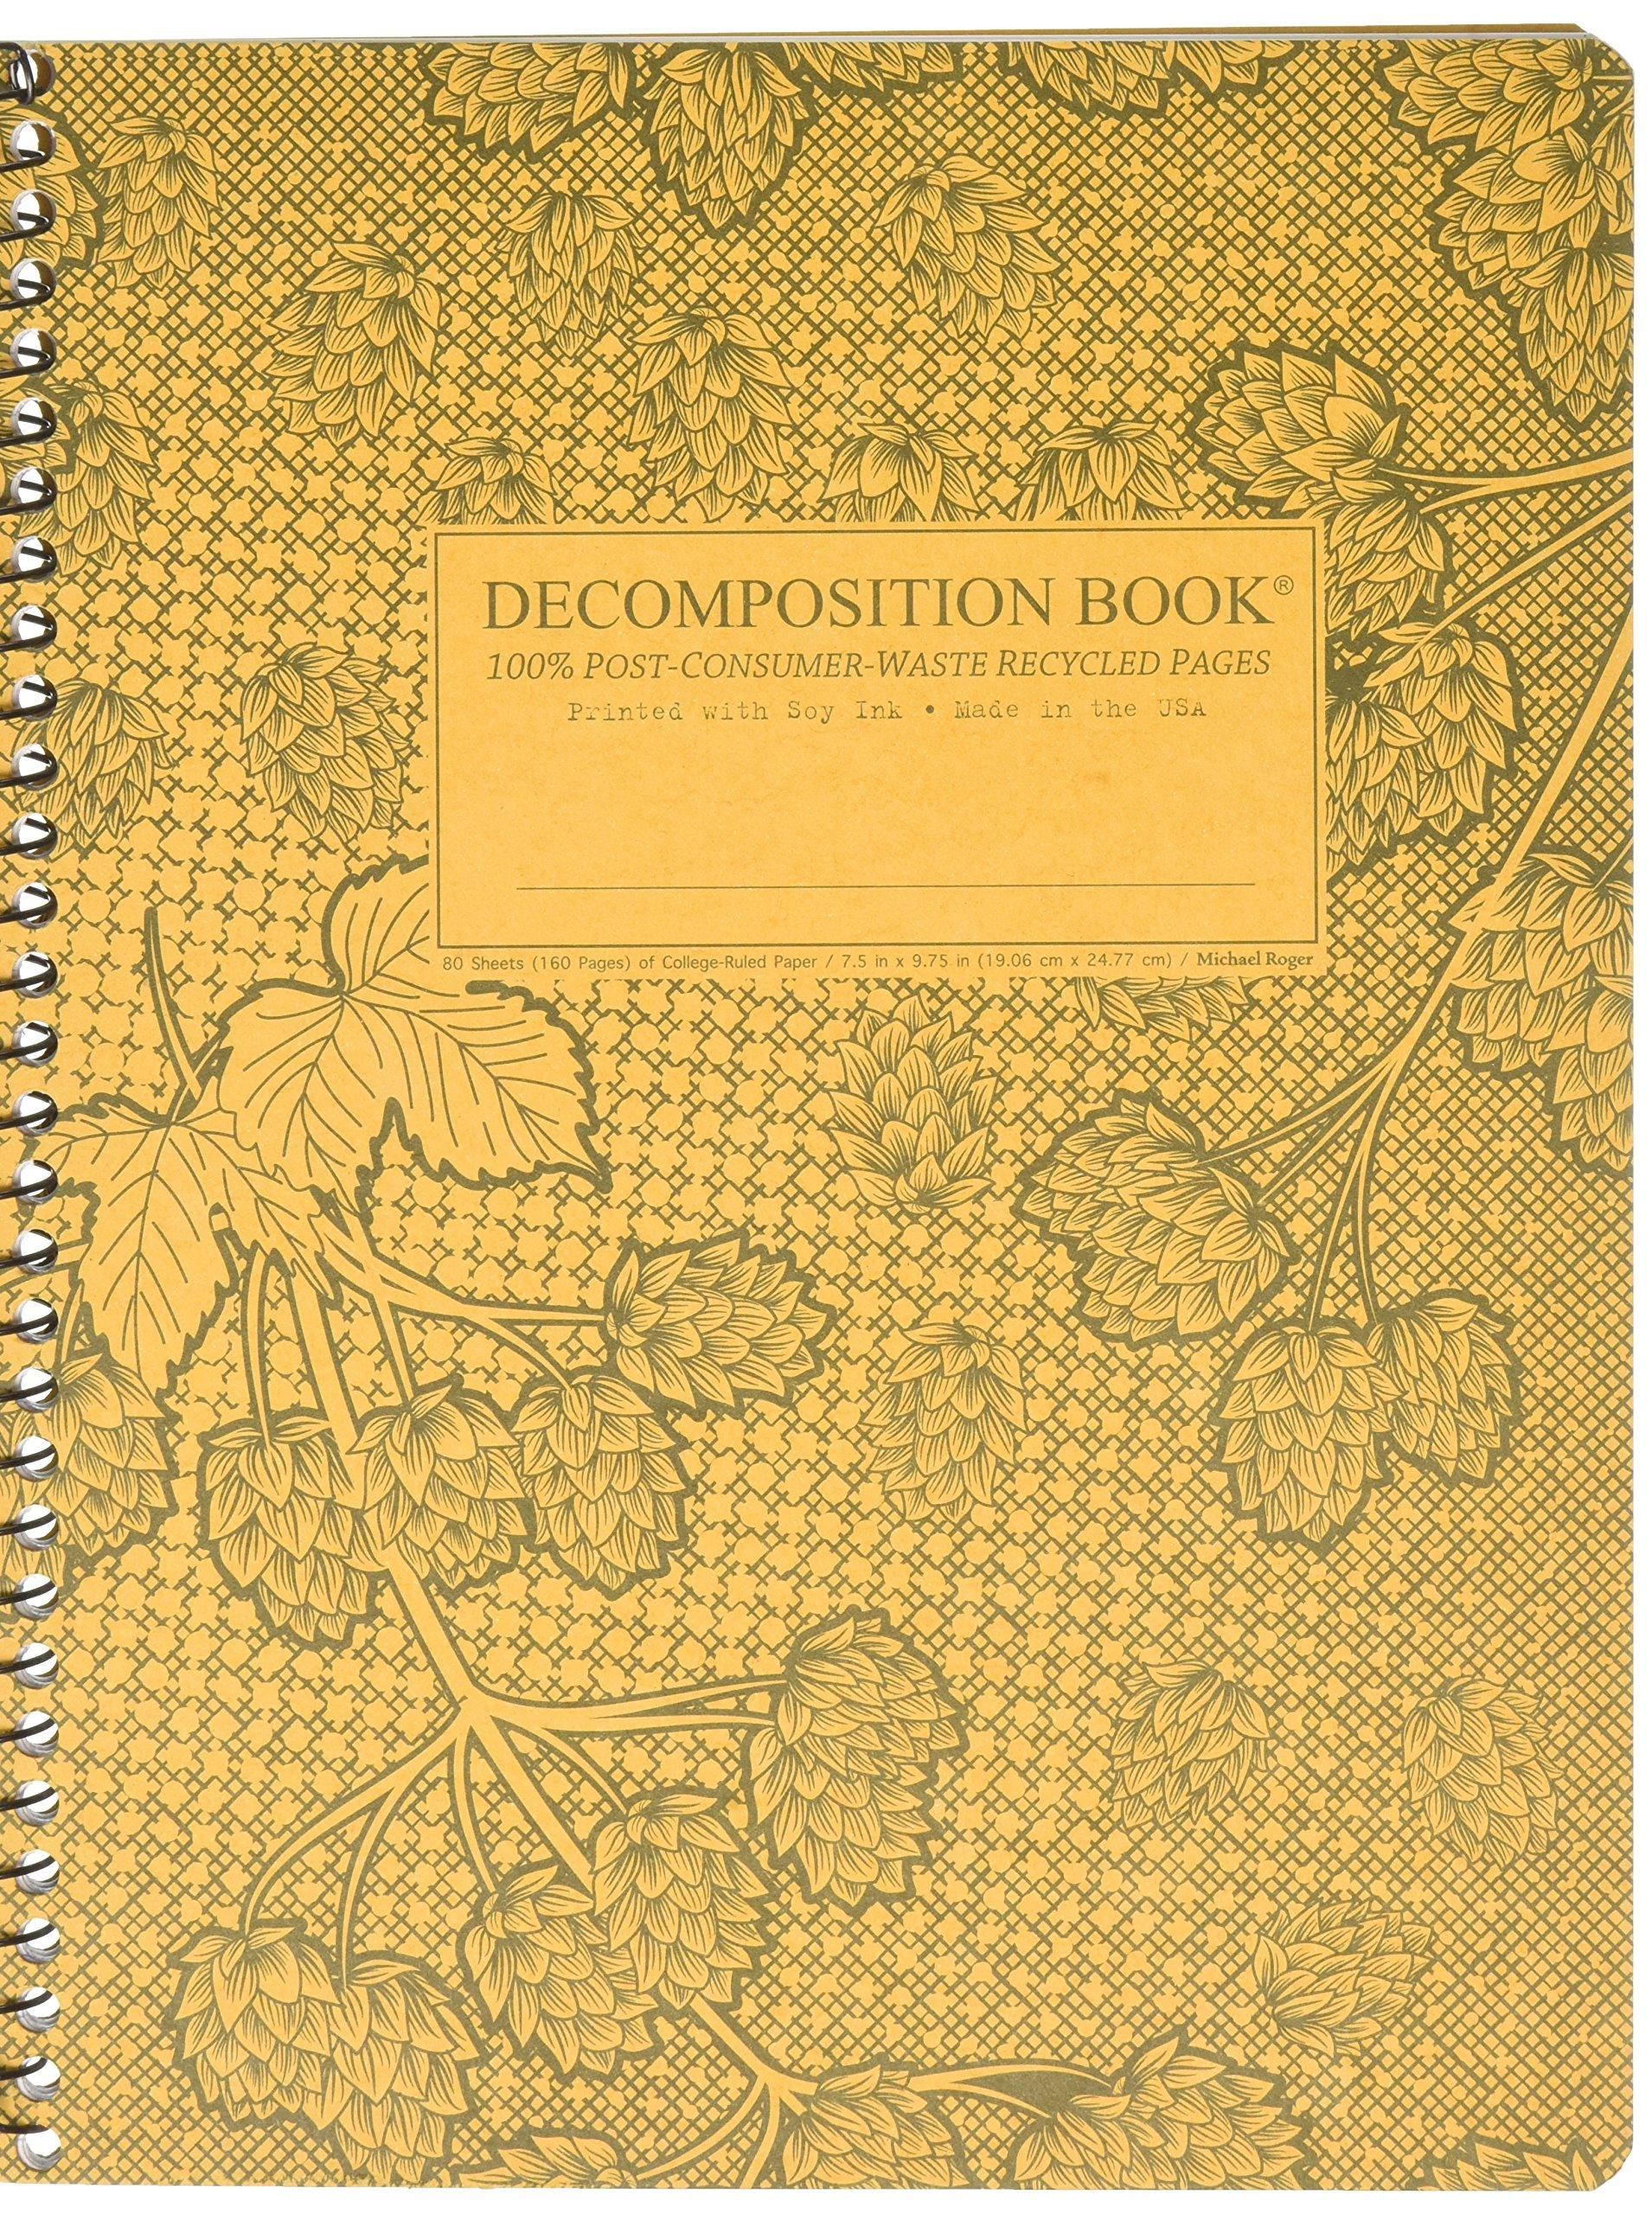 Download Cascade Hops Coilbound Decomposition Ruled Book ebook